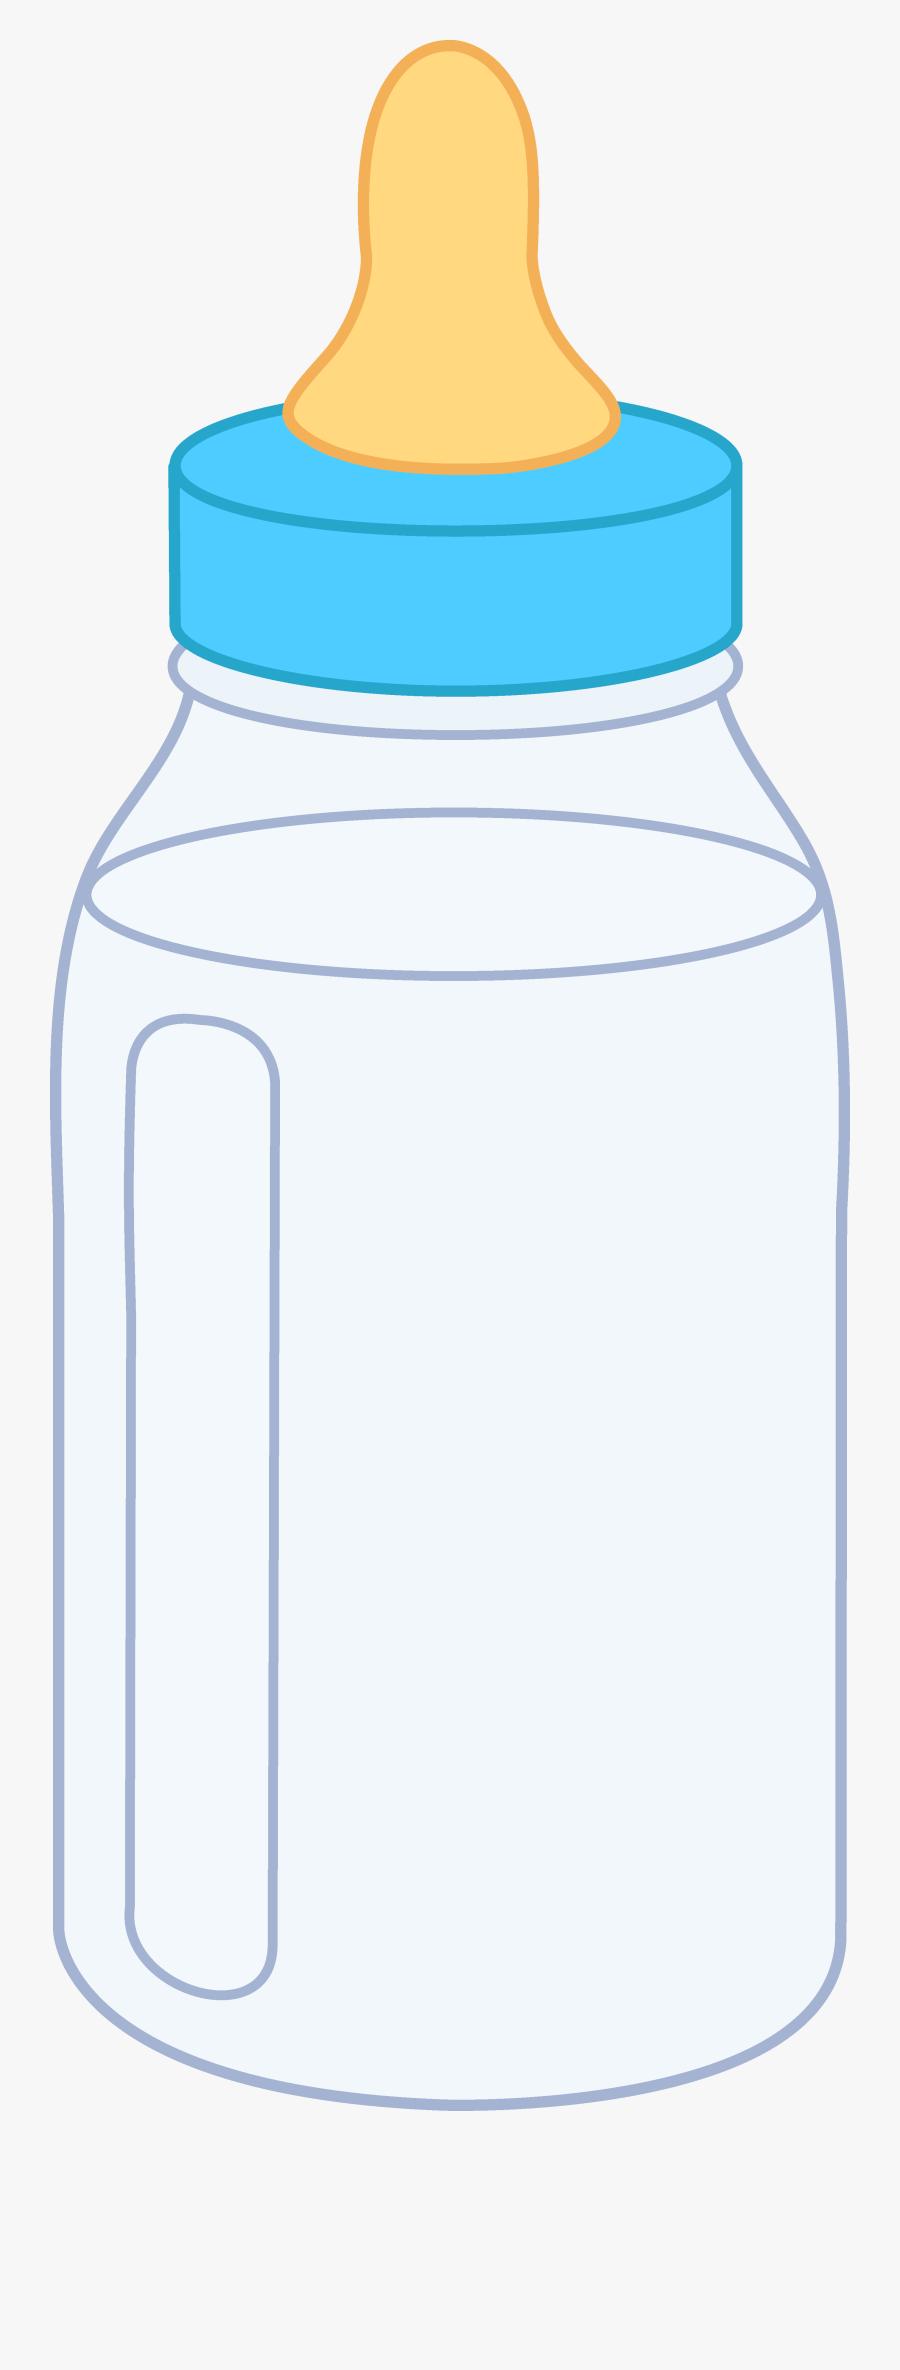 Blue Baby Bottle - Baby Bottle Of Milk Cartoon, Transparent Clipart